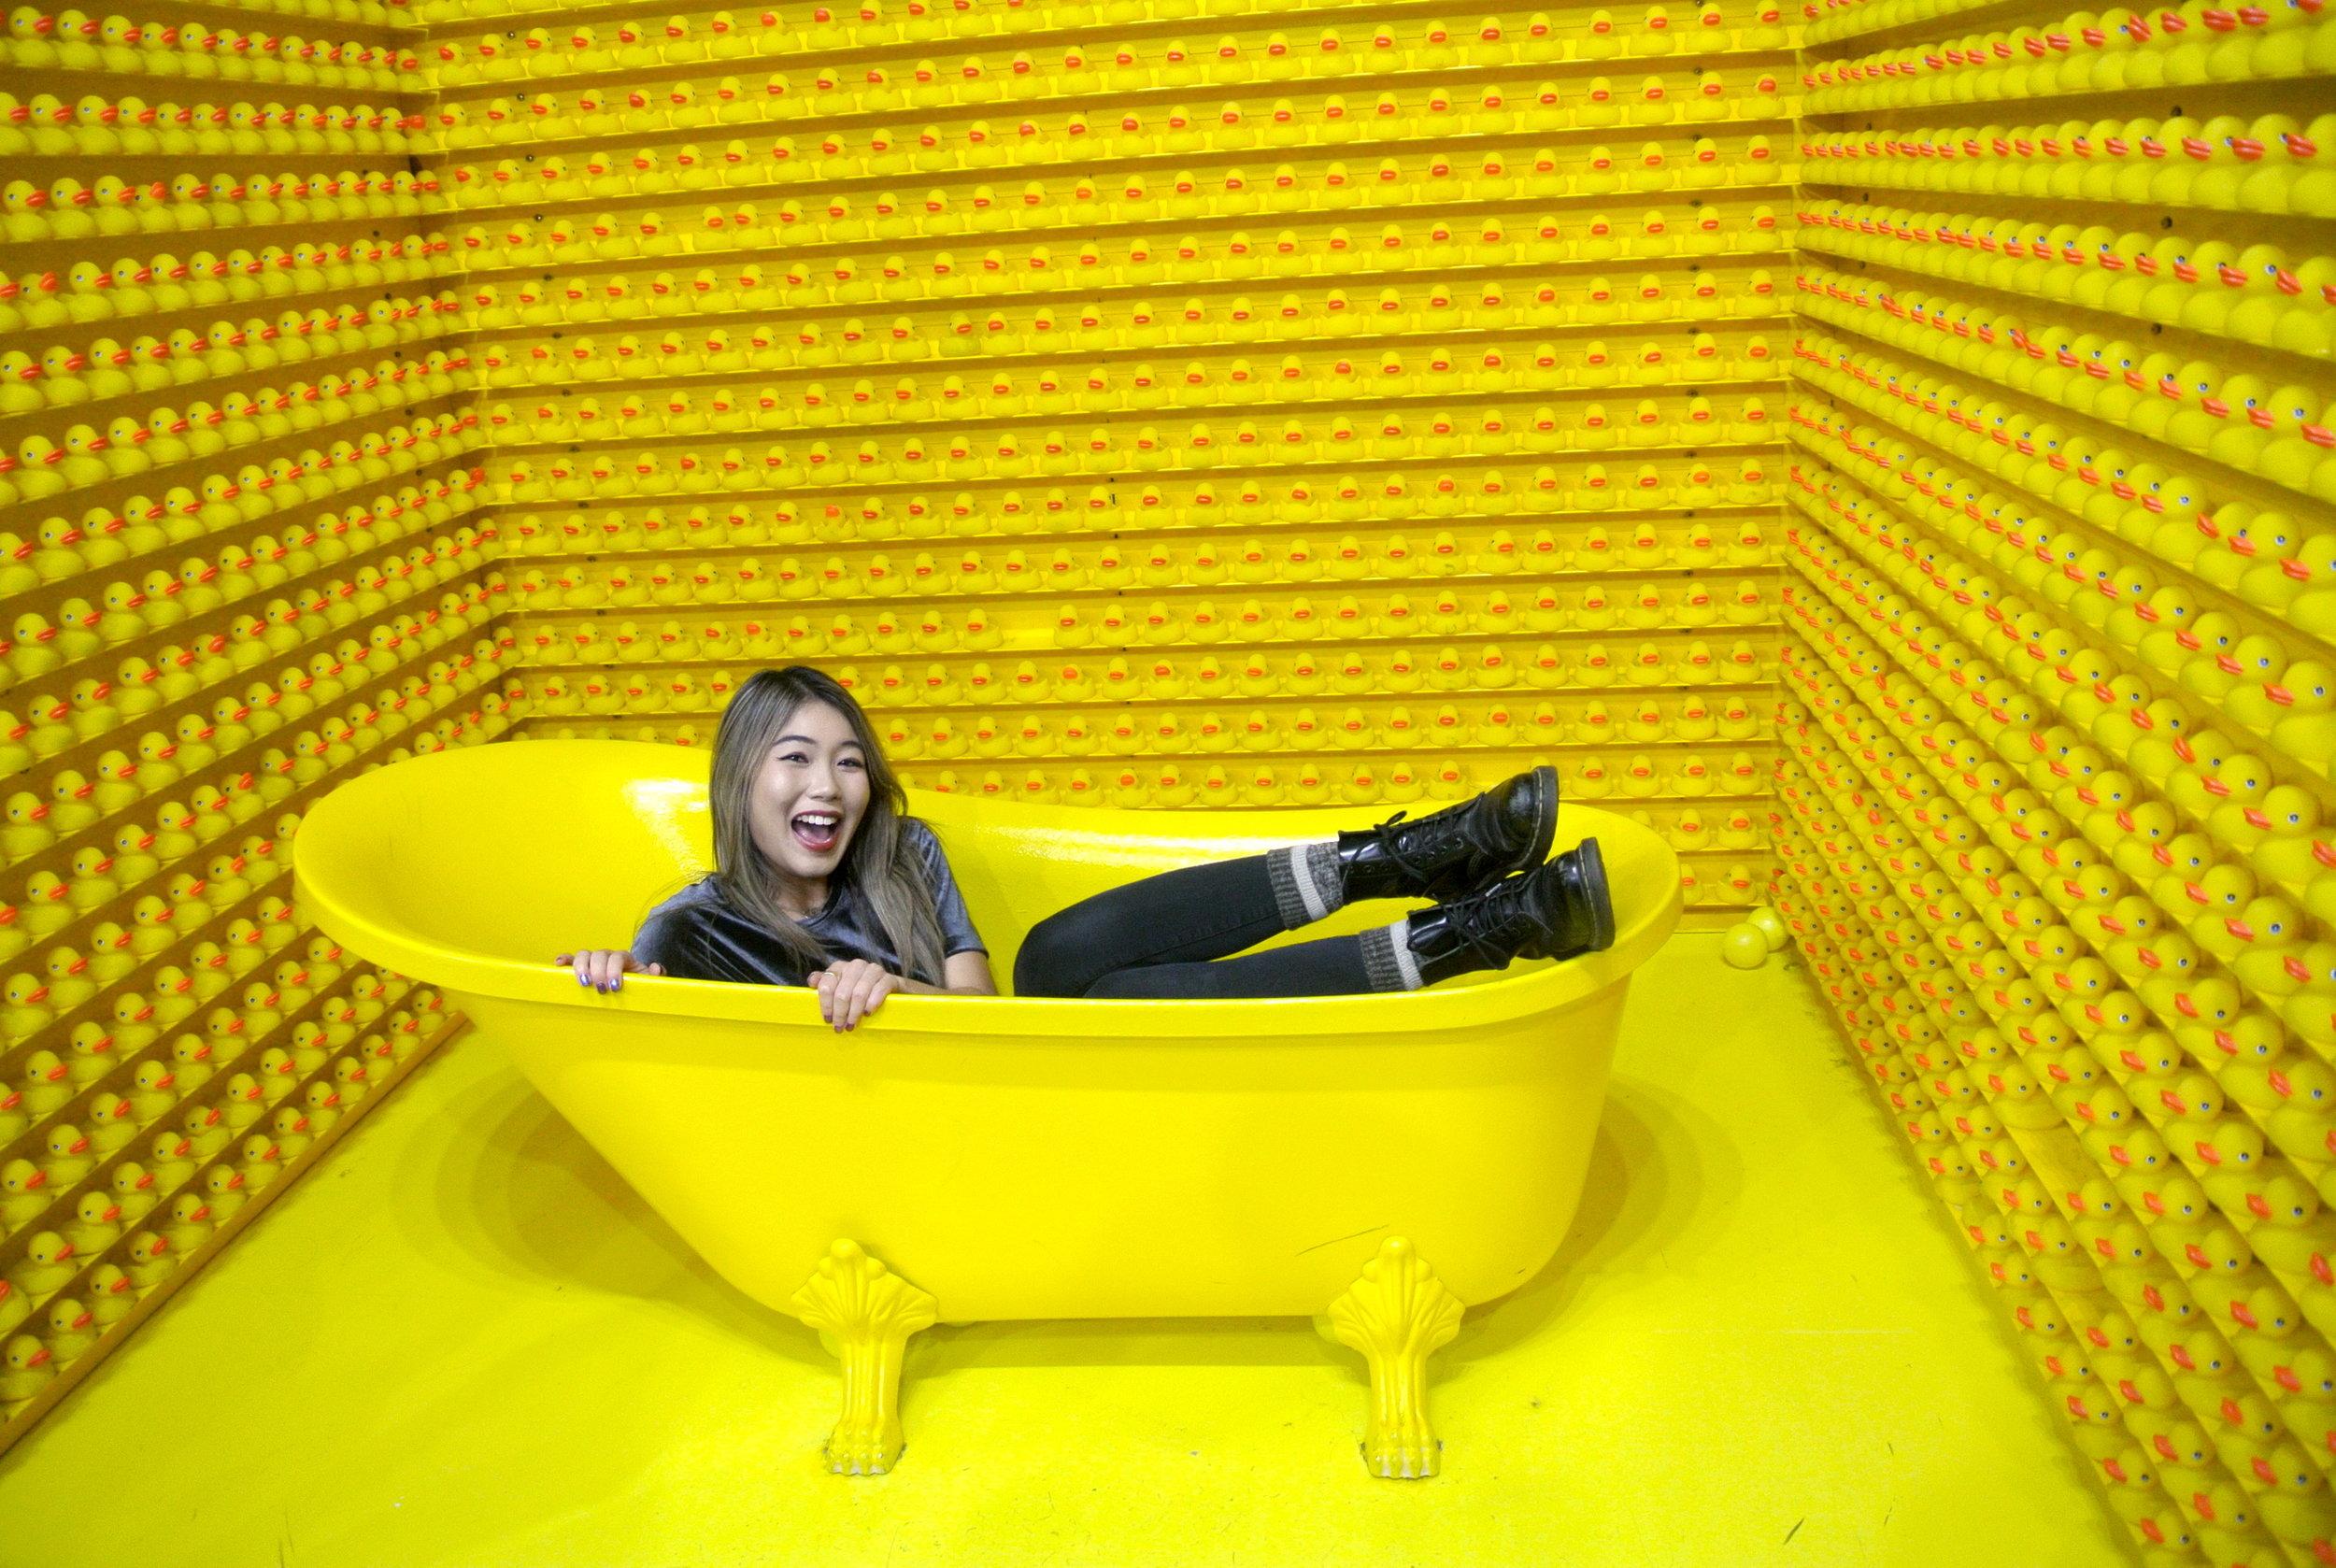 Rubber Ducky Bathtub